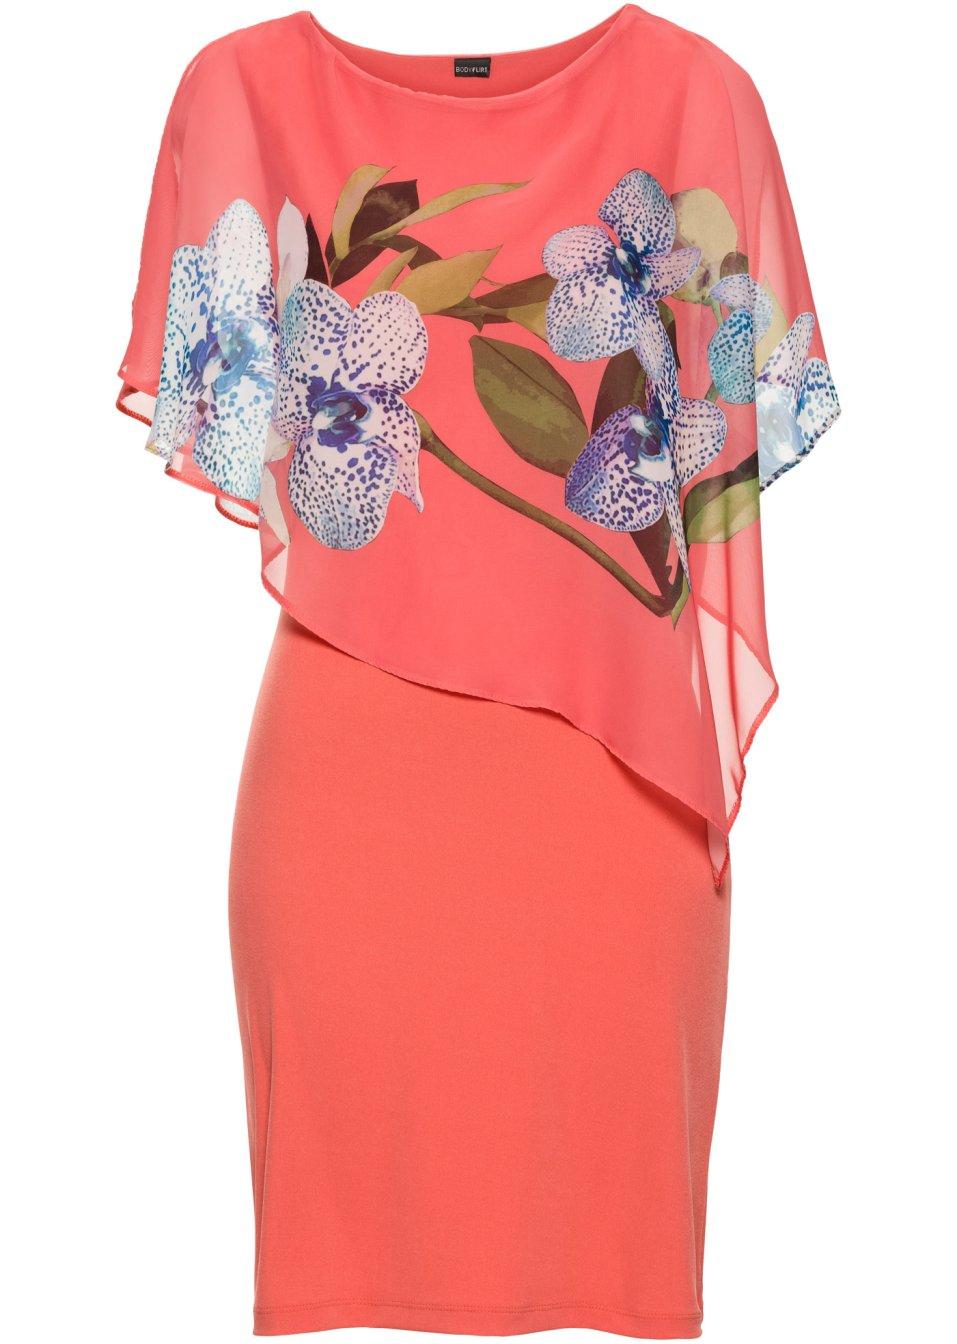 hinrei endes kleid mit bedrucktem chiffon berwurf pink koralle mit orchideen print. Black Bedroom Furniture Sets. Home Design Ideas